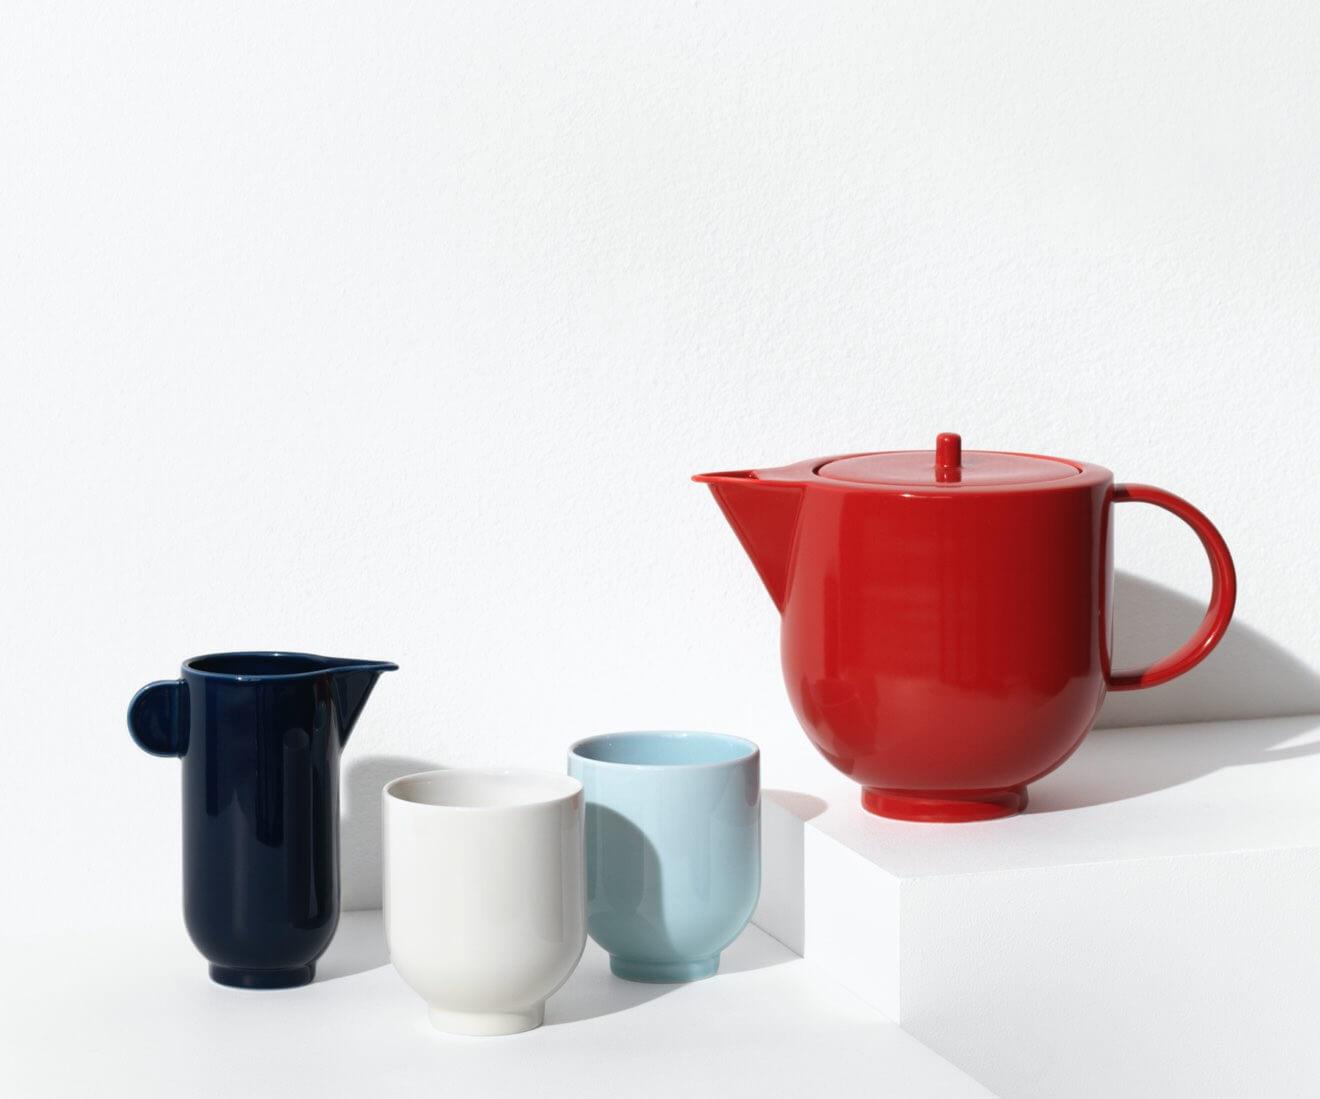 Motarasu Products - Yoko tea pot in red, pitcher in blue, Light blue and white mug by Stilleben